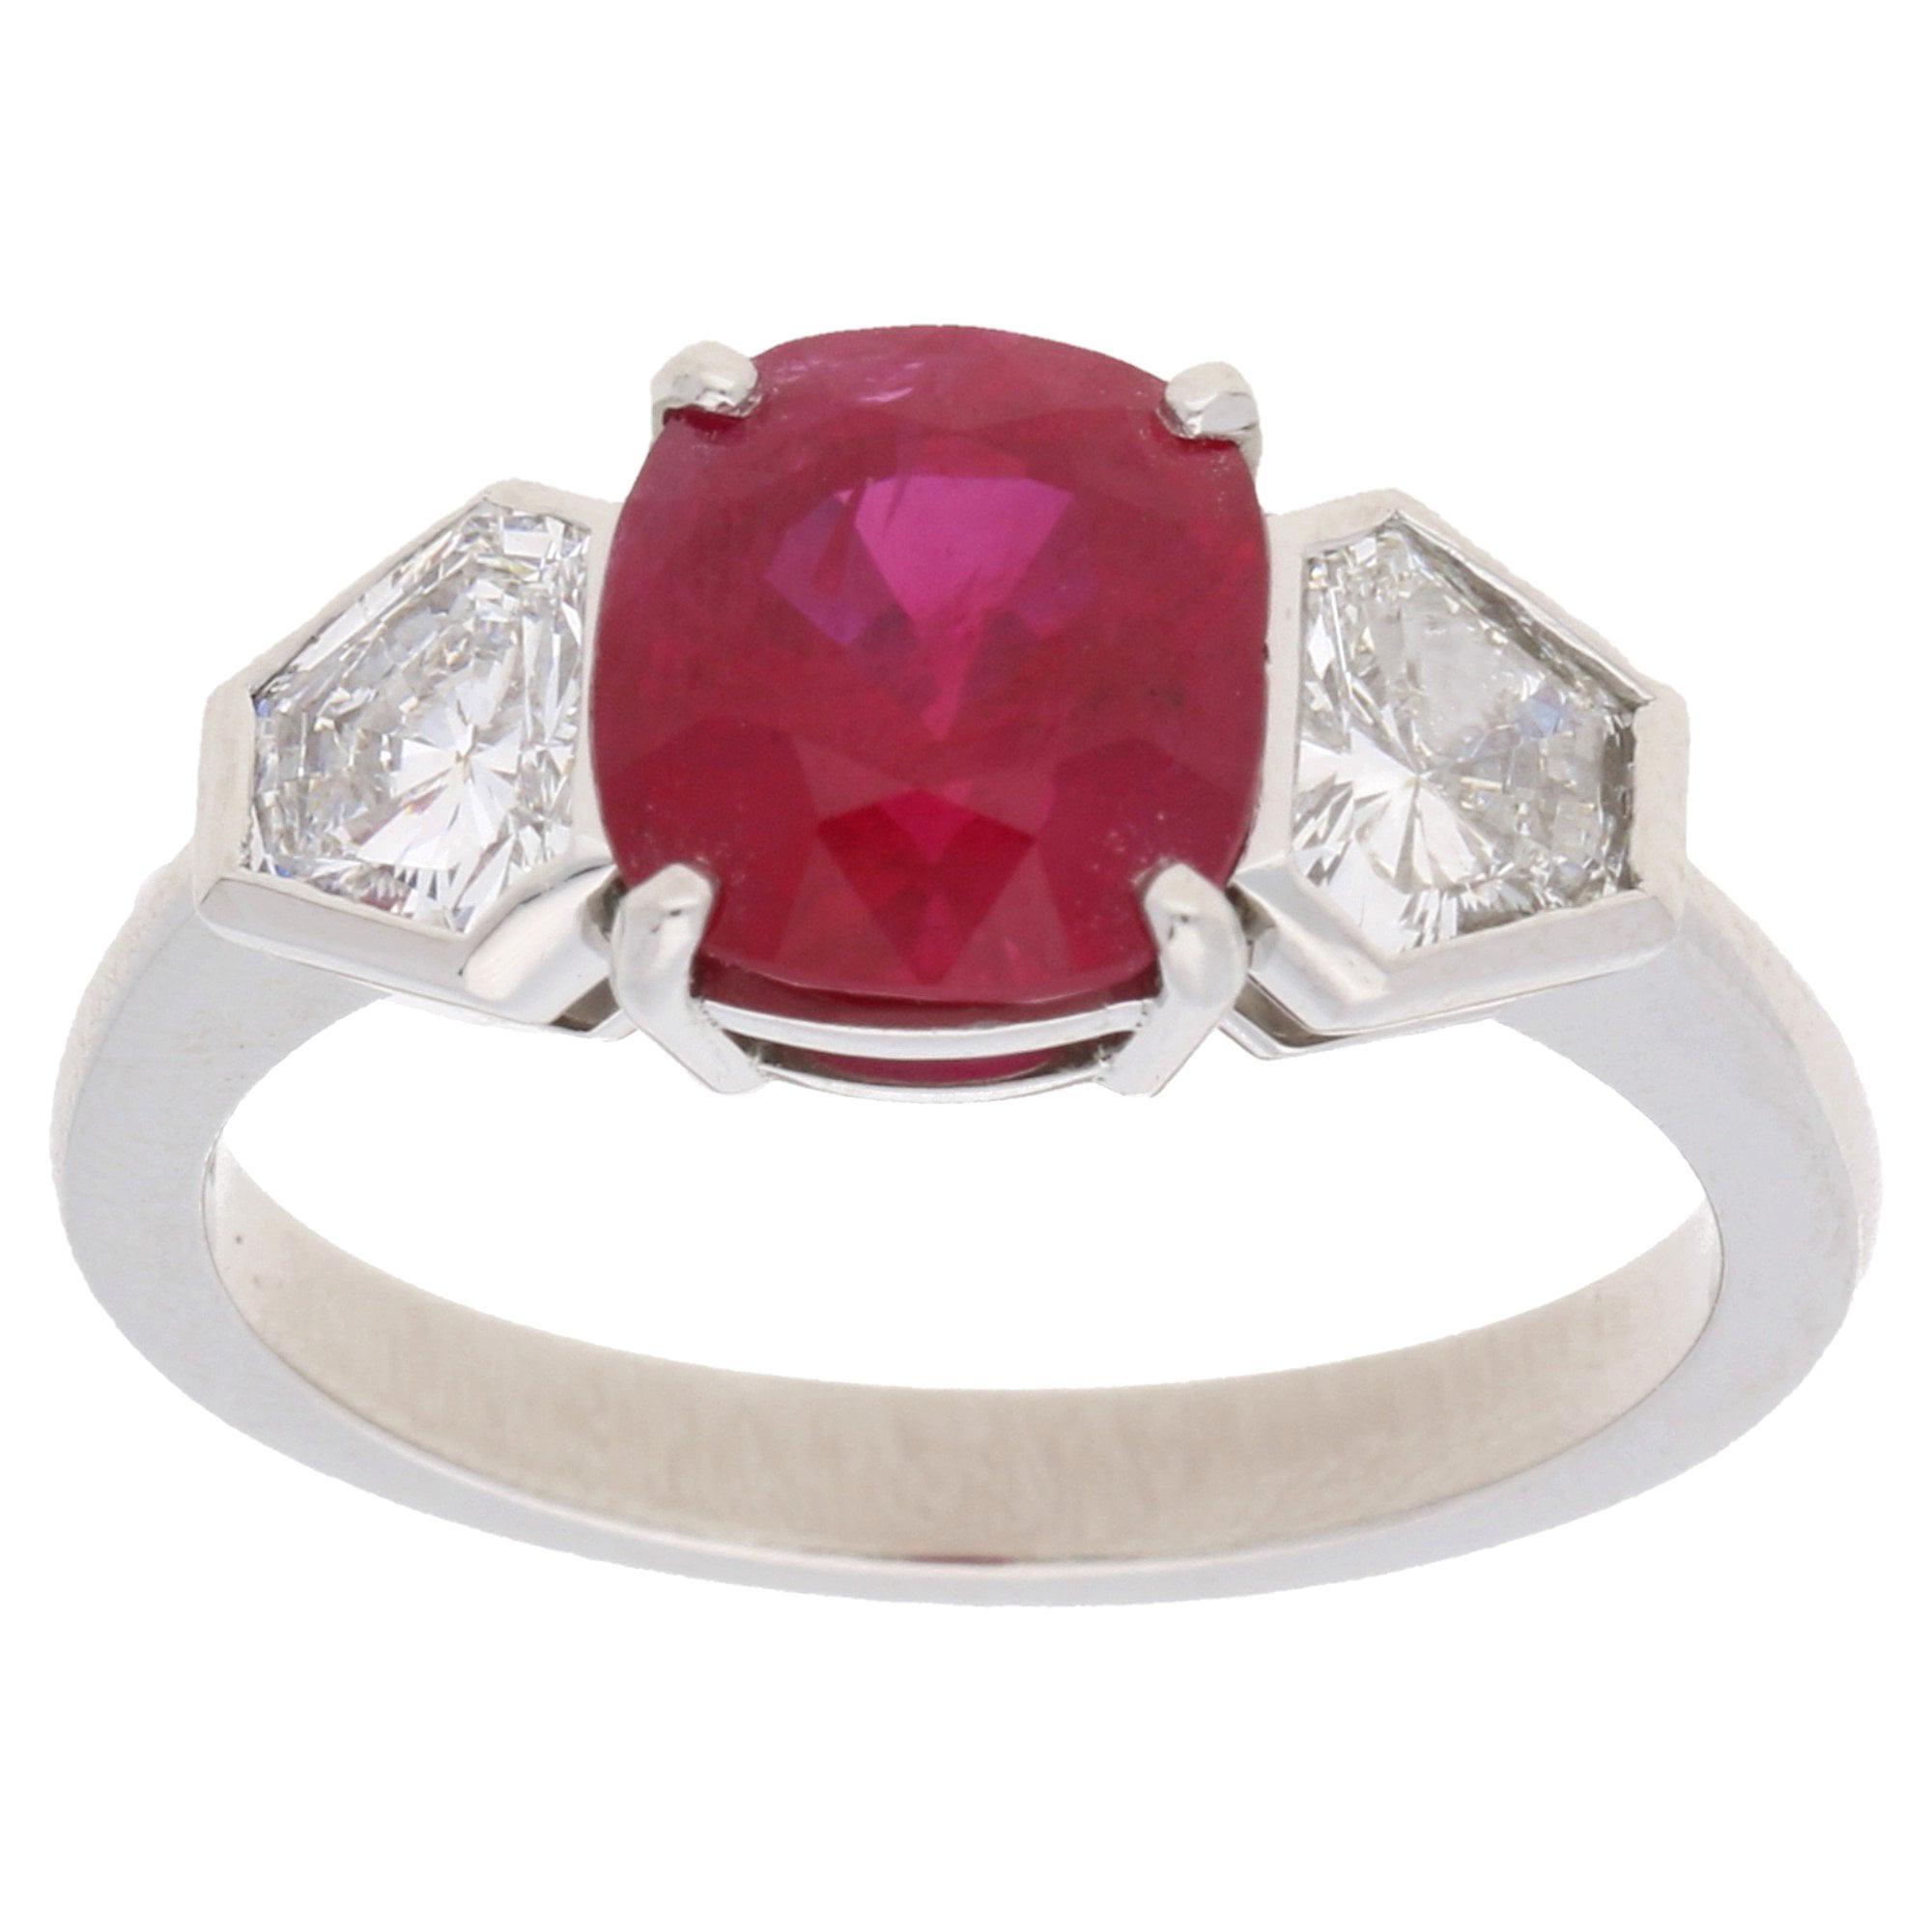 Burmese Ruby and Diamond Three-Stone Engagement Ring Set in Platinum